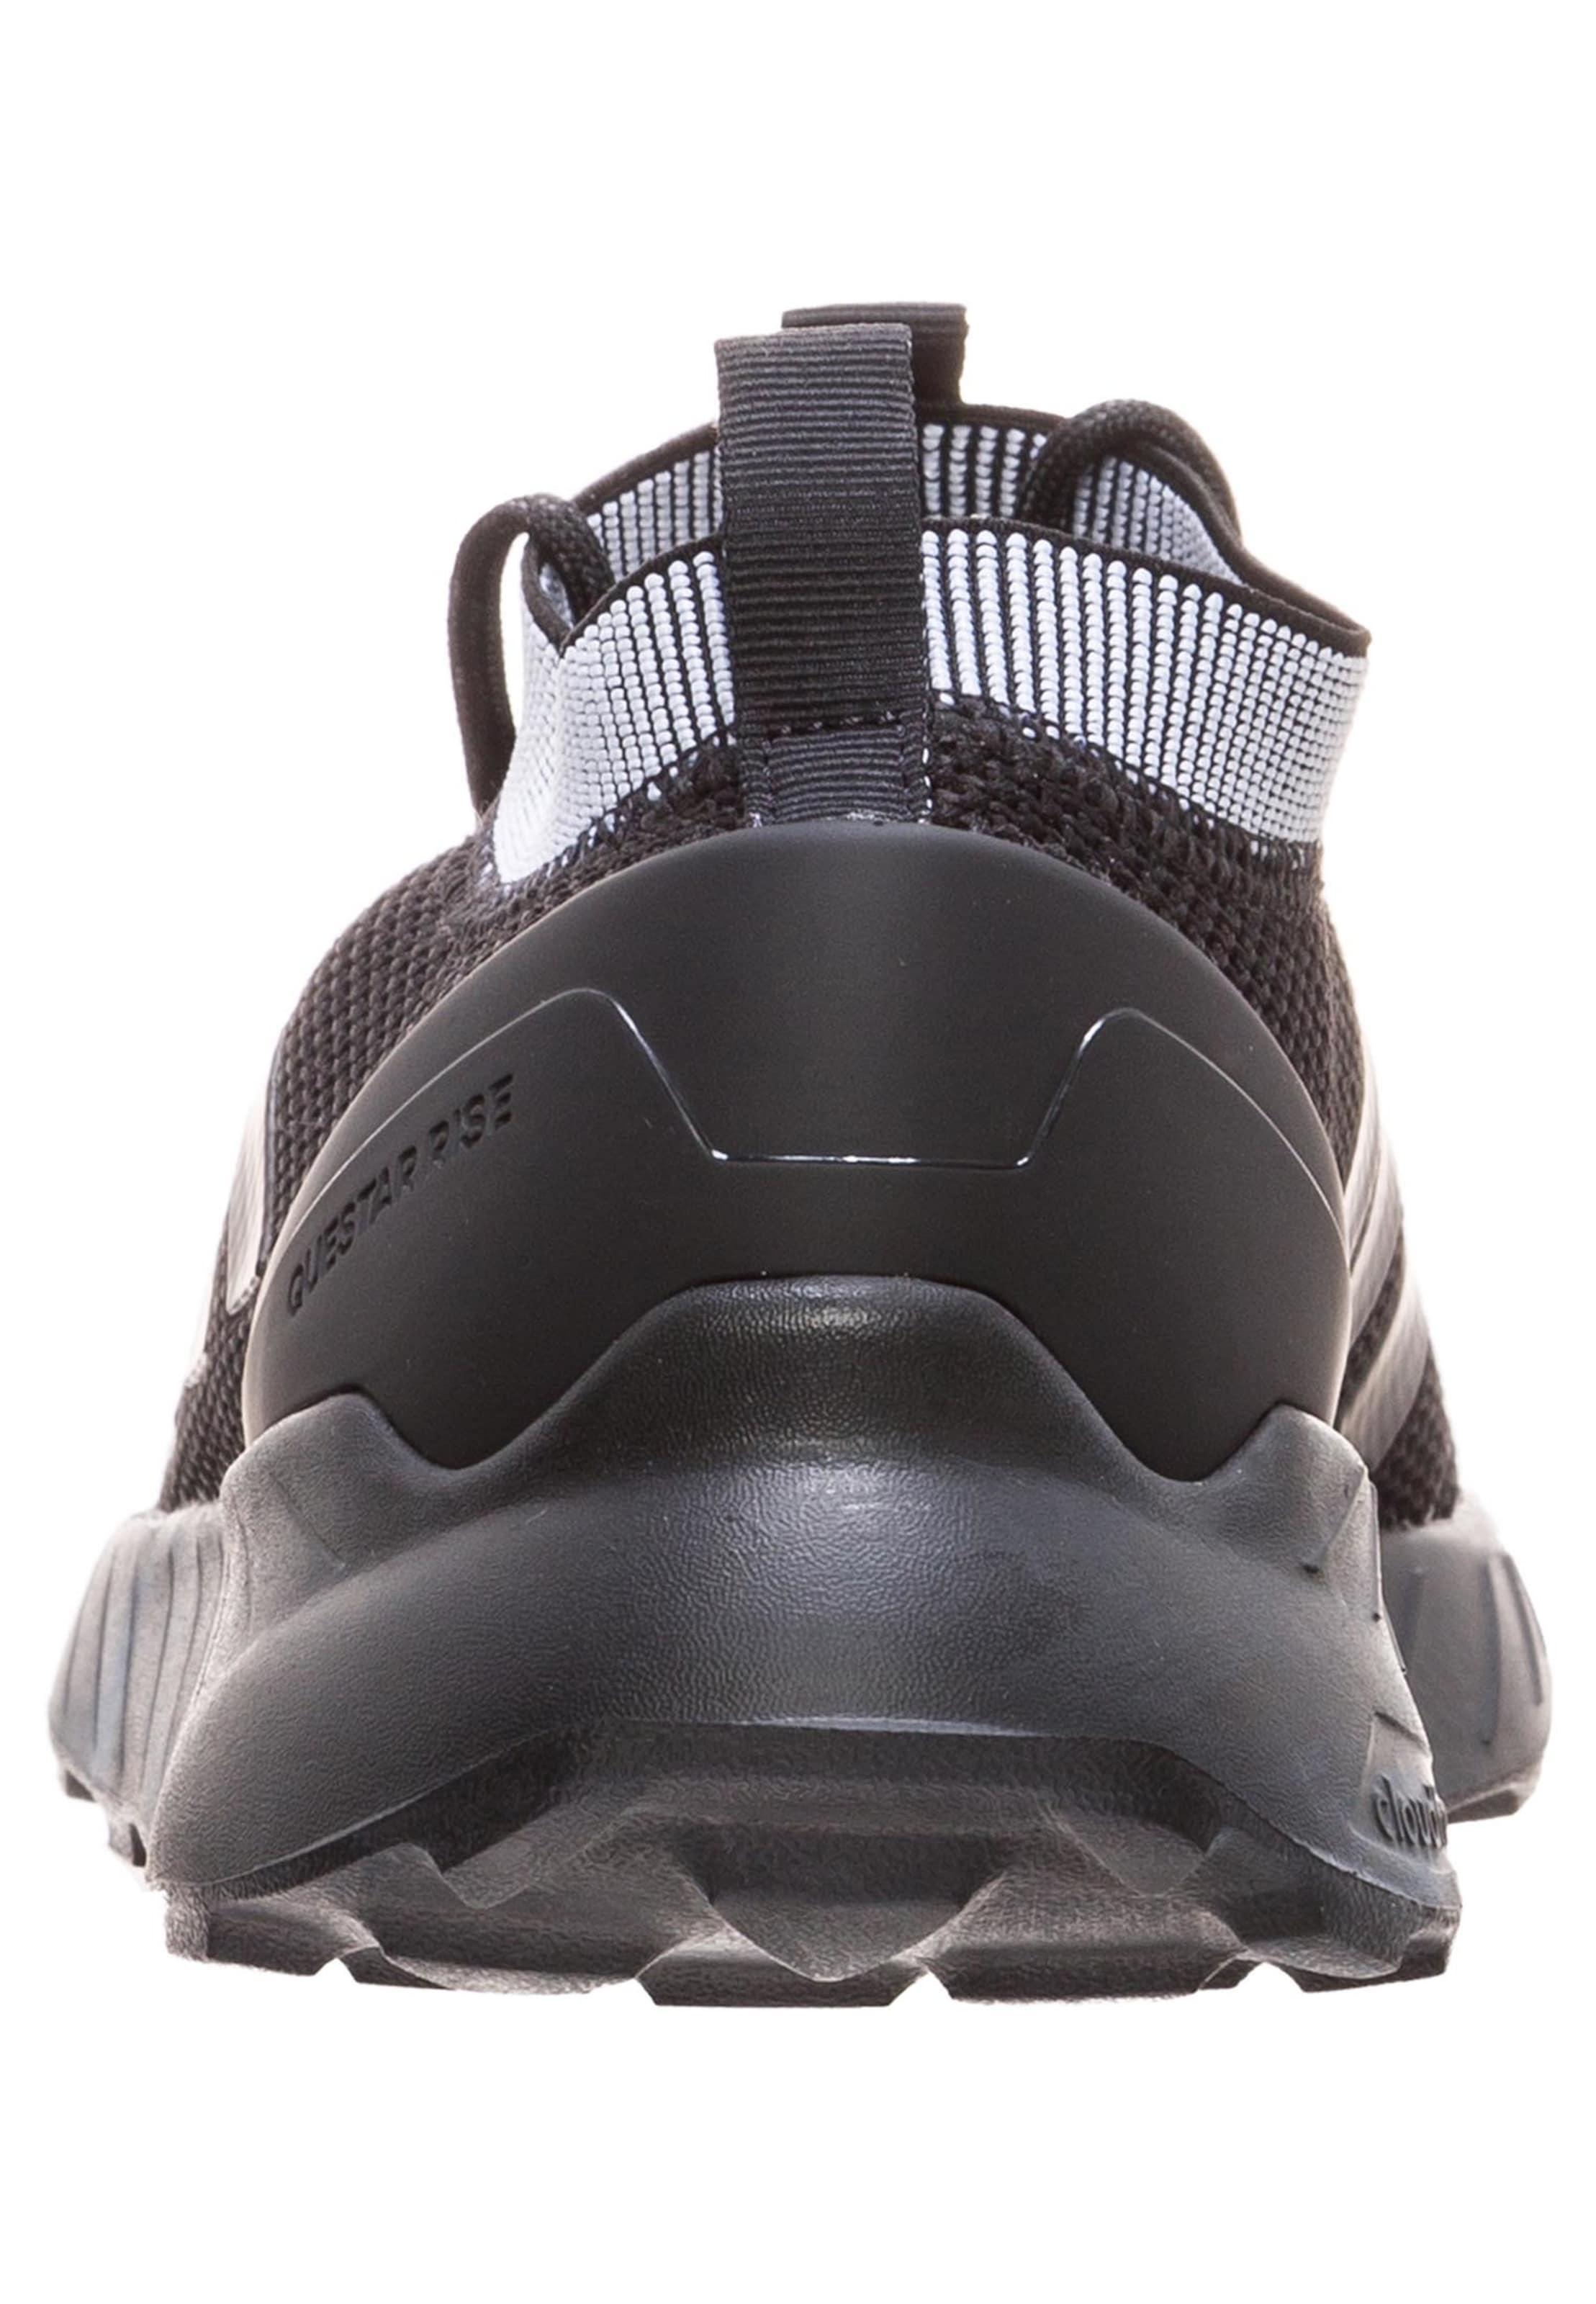 Originals Baskets En Noir Adidas Hautes 'questar' O8nN0wvm